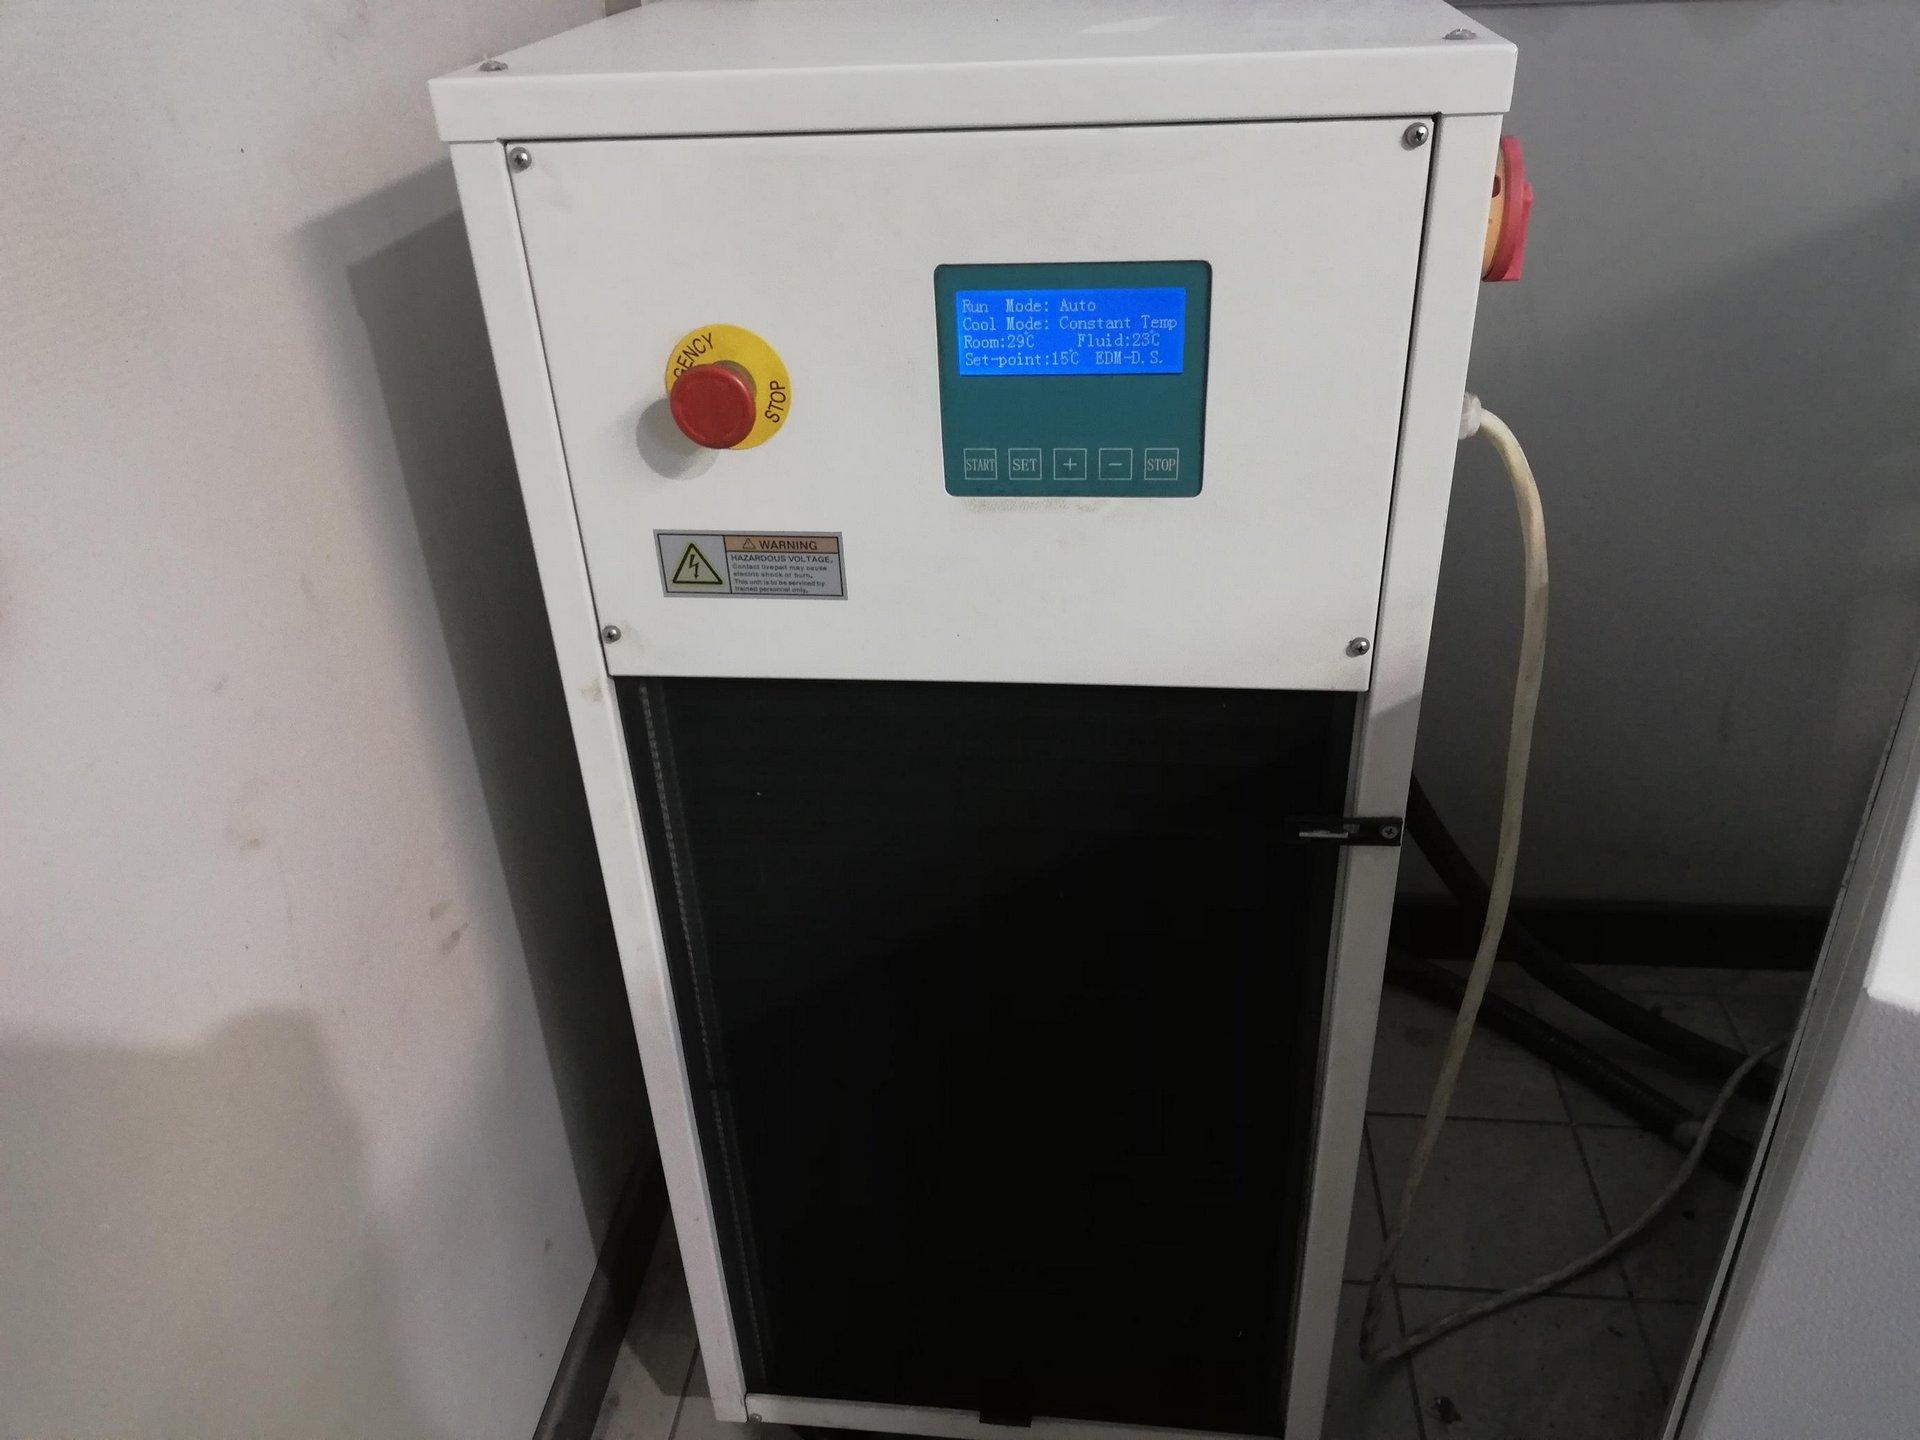 Elettroerosione a tuffo AGIE CHARMILLES FORM 20 in vendita - foto 8